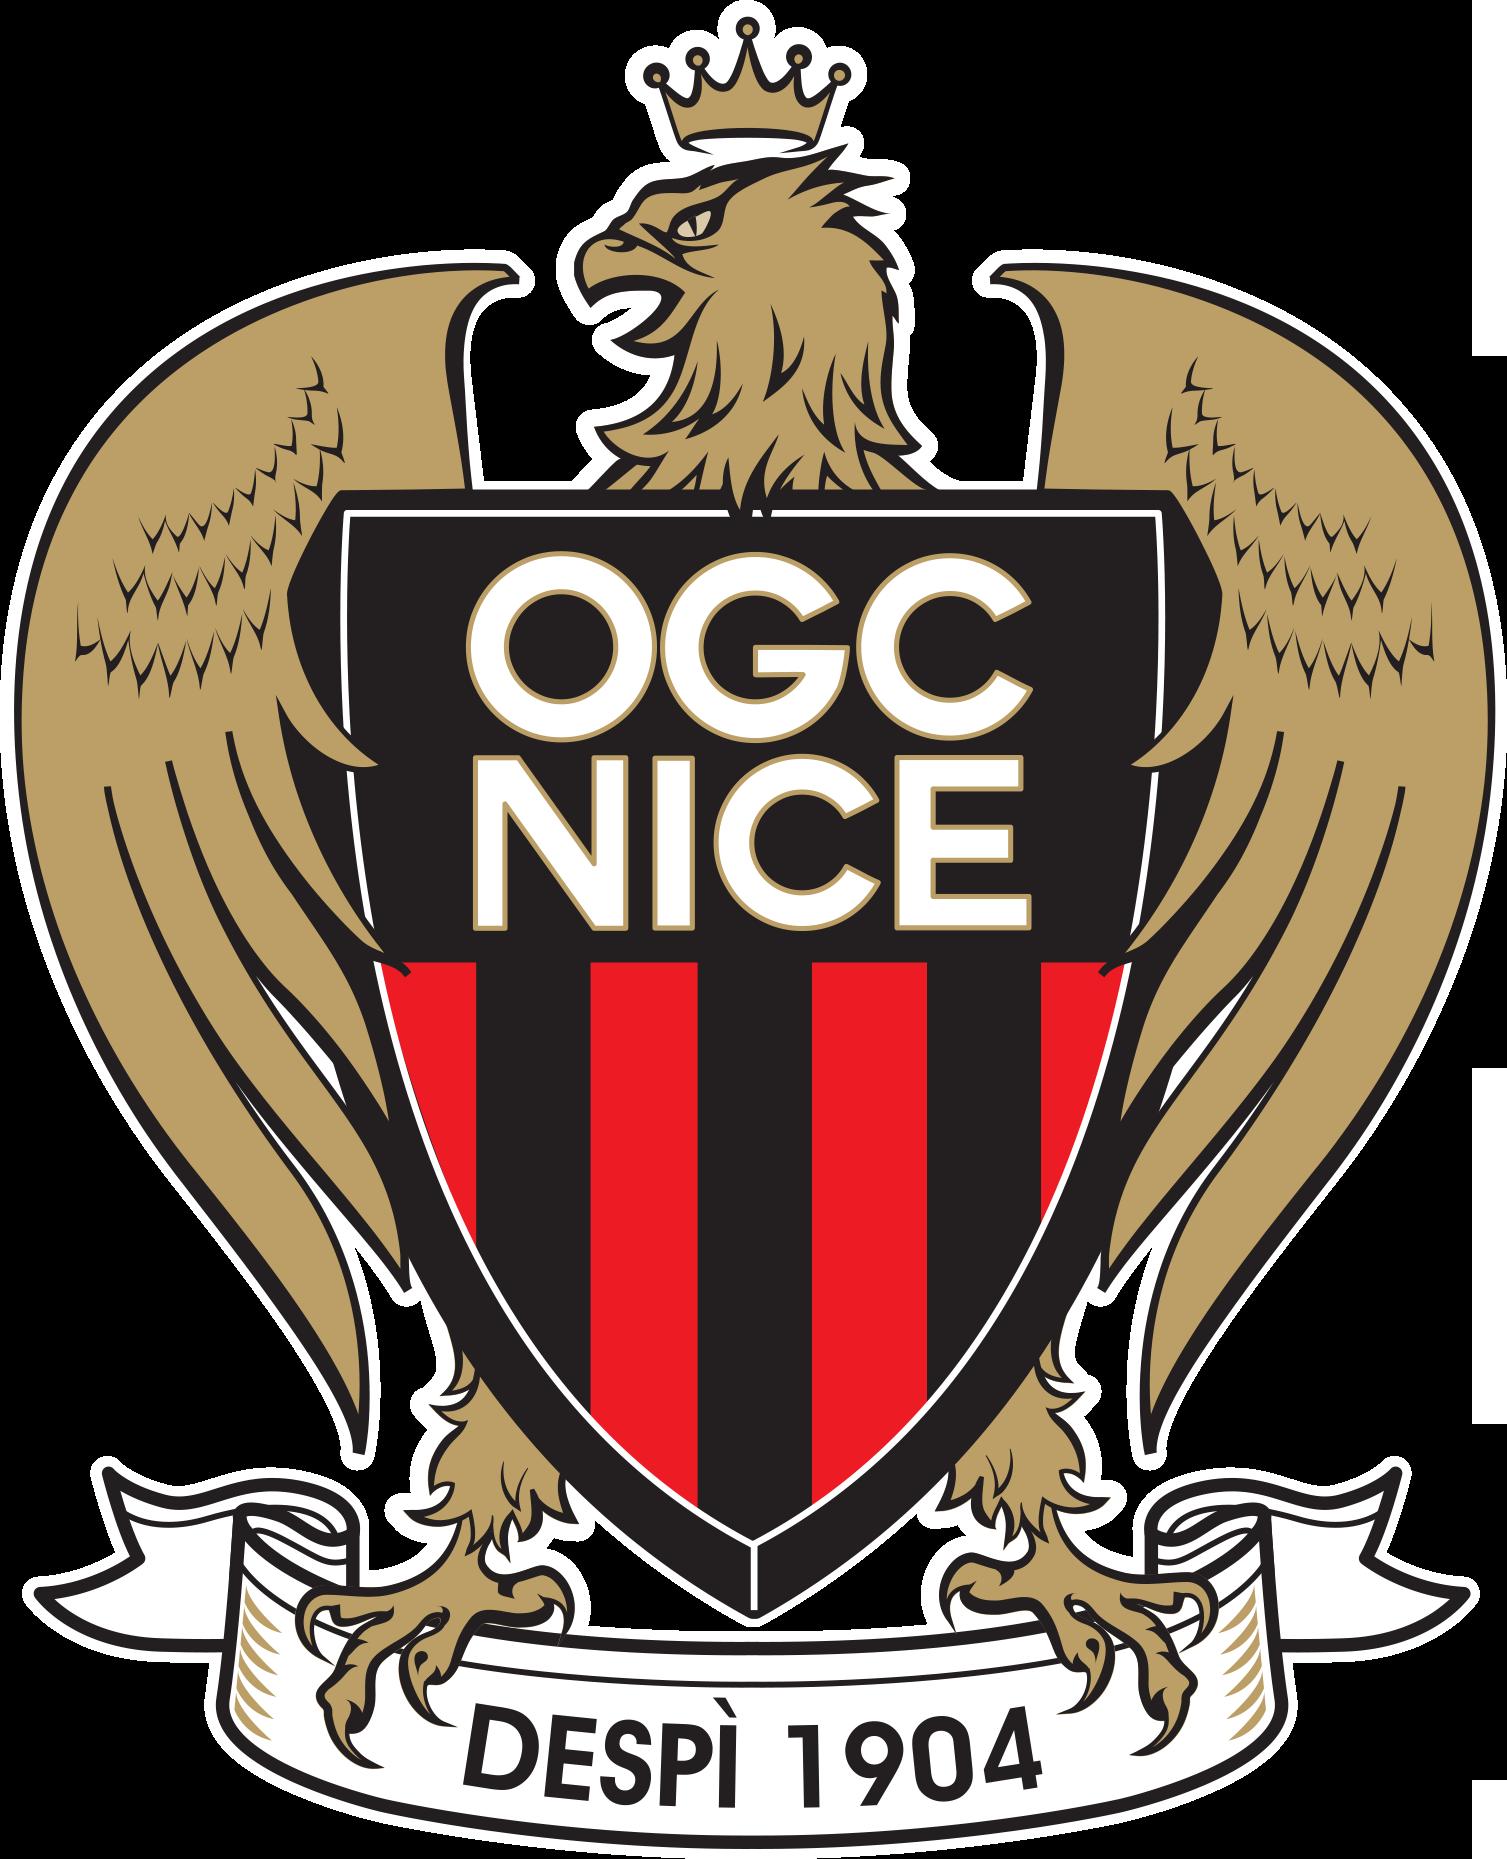 L'OGC NICE